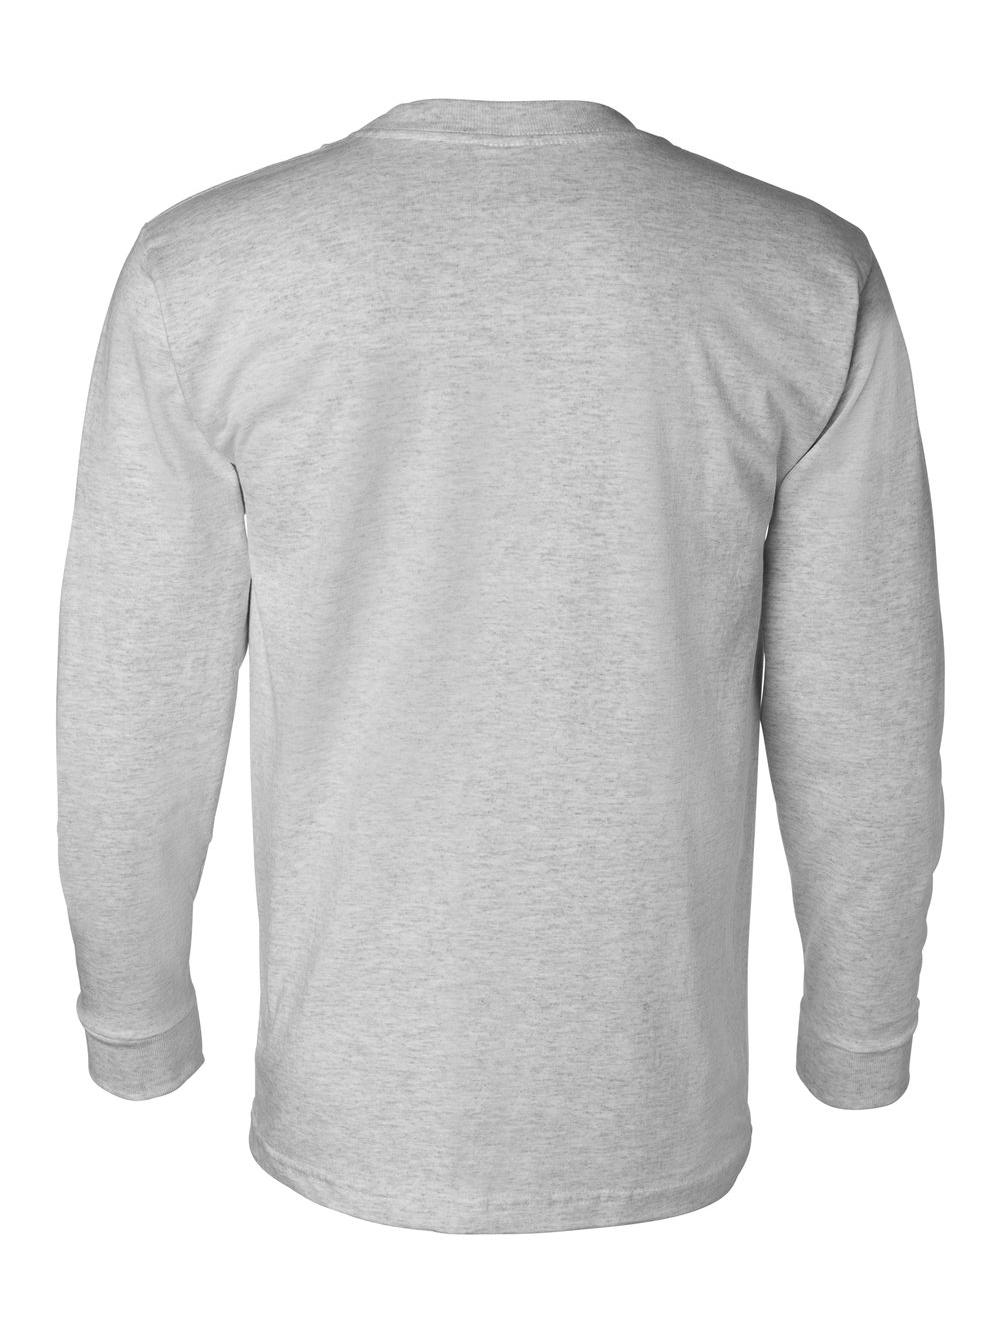 Bayside-USA-Made-Long-Sleeve-T-Shirt-with-a-Pocket-8100 thumbnail 10